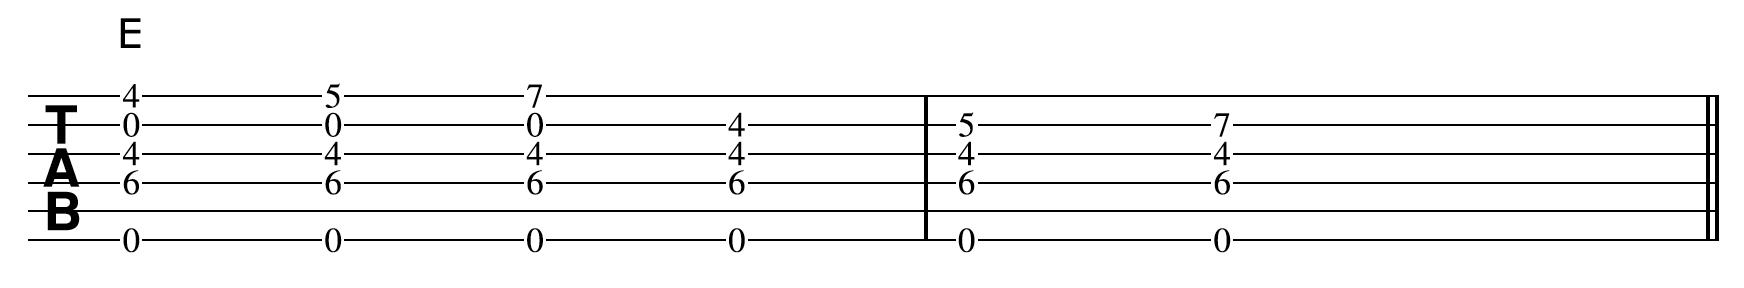 Creative Guitar E Chord Diatonic 2